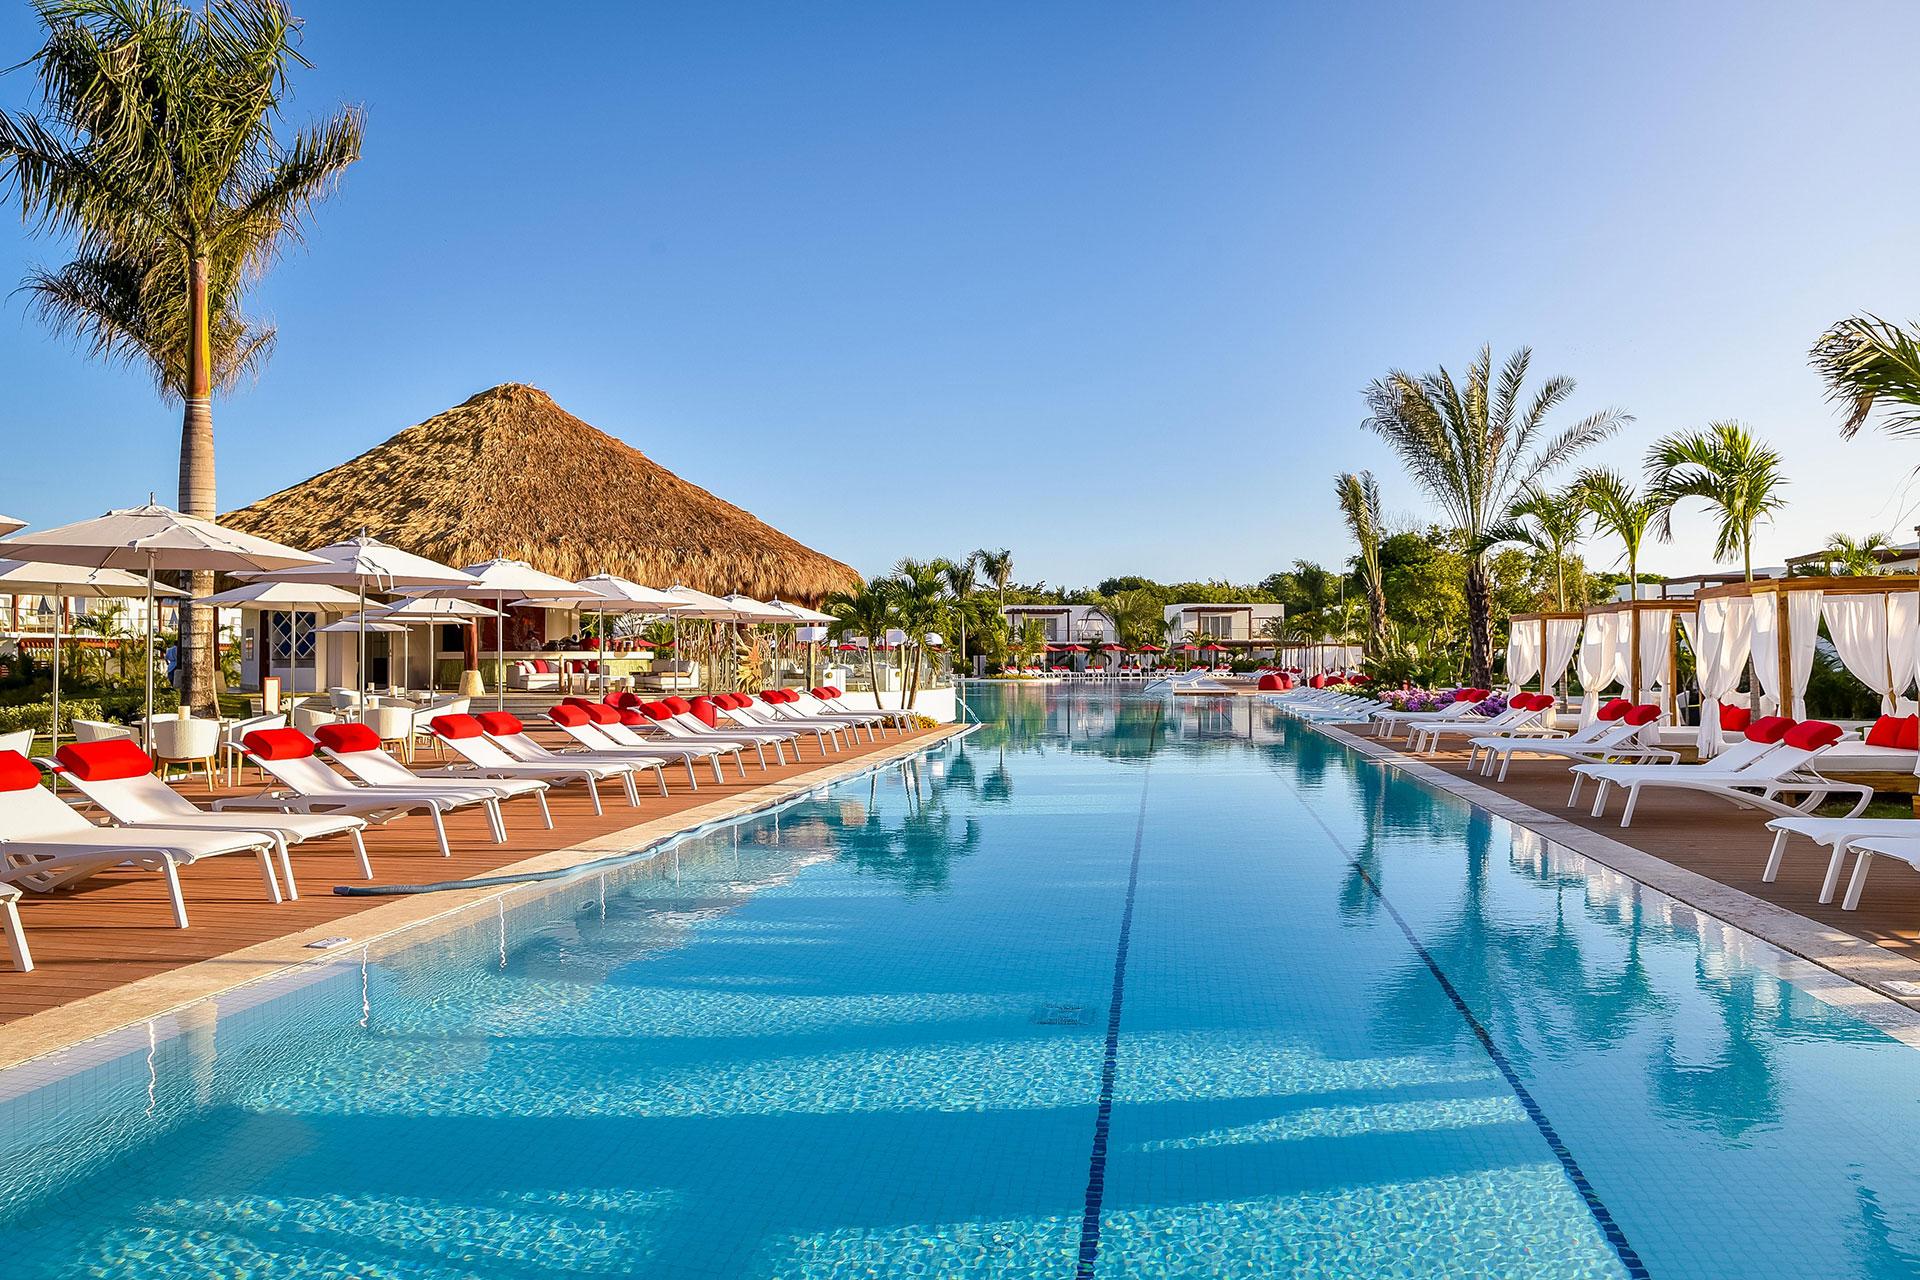 Pool at Club Med Punta Cana; Courtesy of Club Med Punta Cana